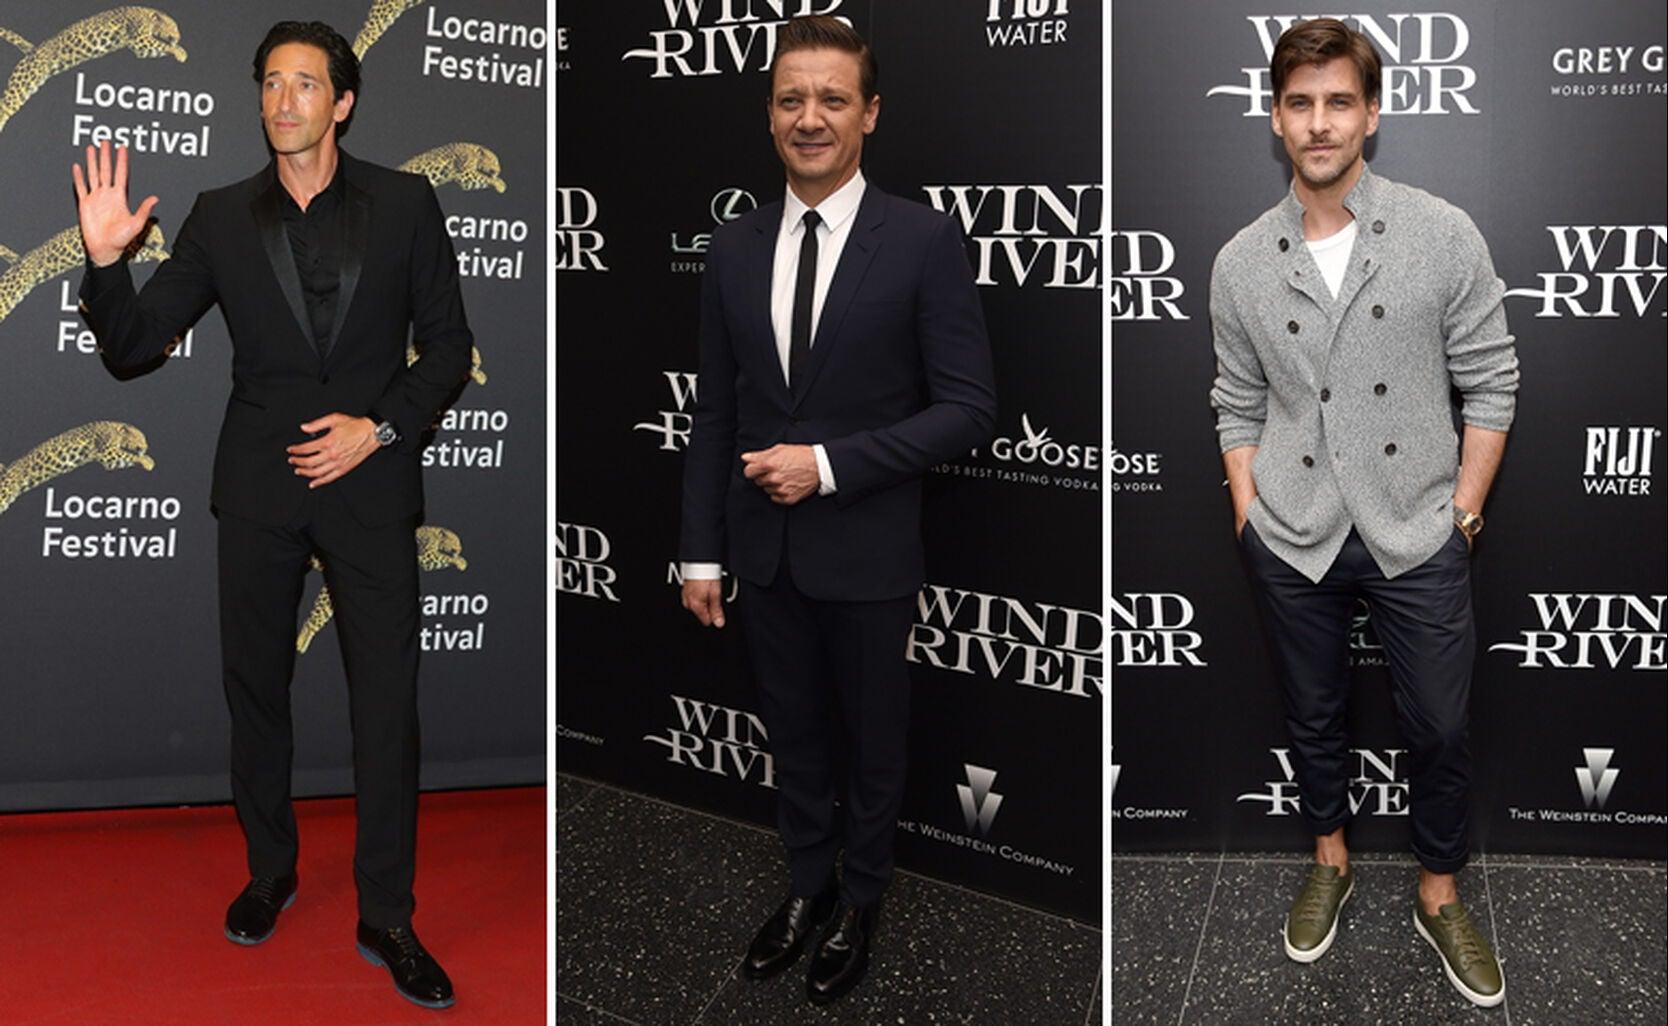 Adrien Brody, Jeremy Renner and Johannes Huebl